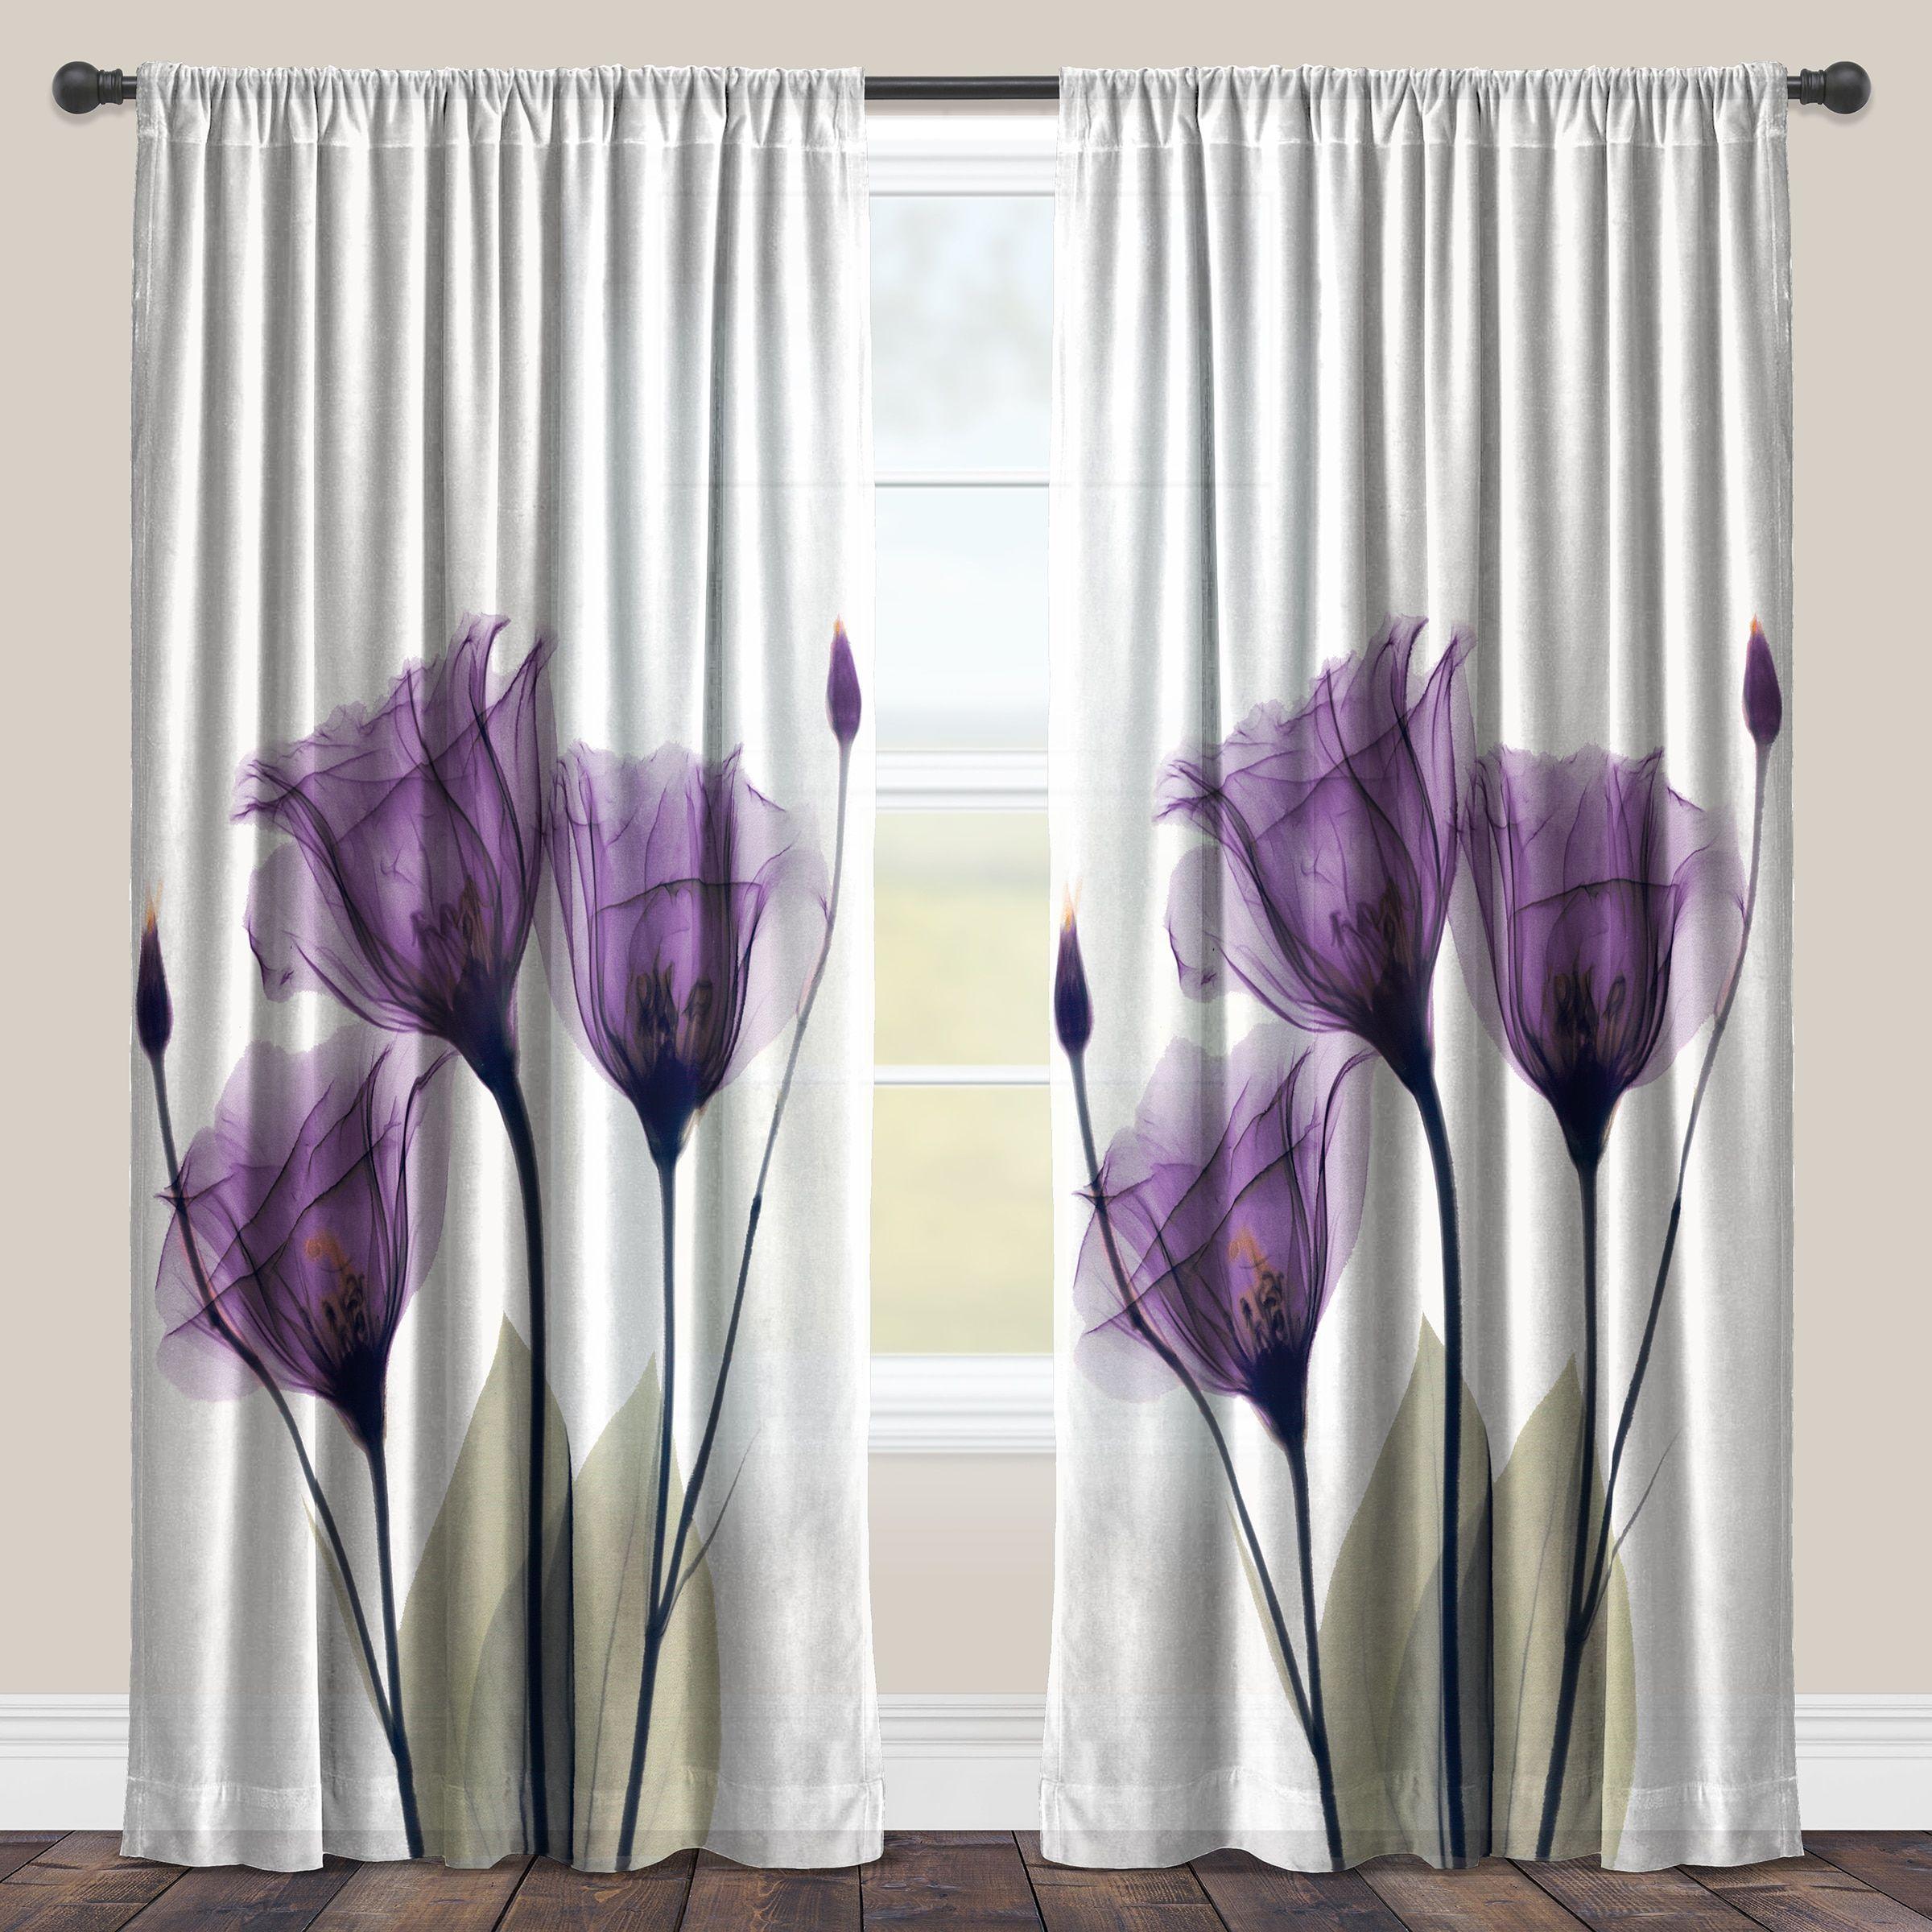 curtains solid table taffeta drapes or solidtaffeta purple tabledrapes